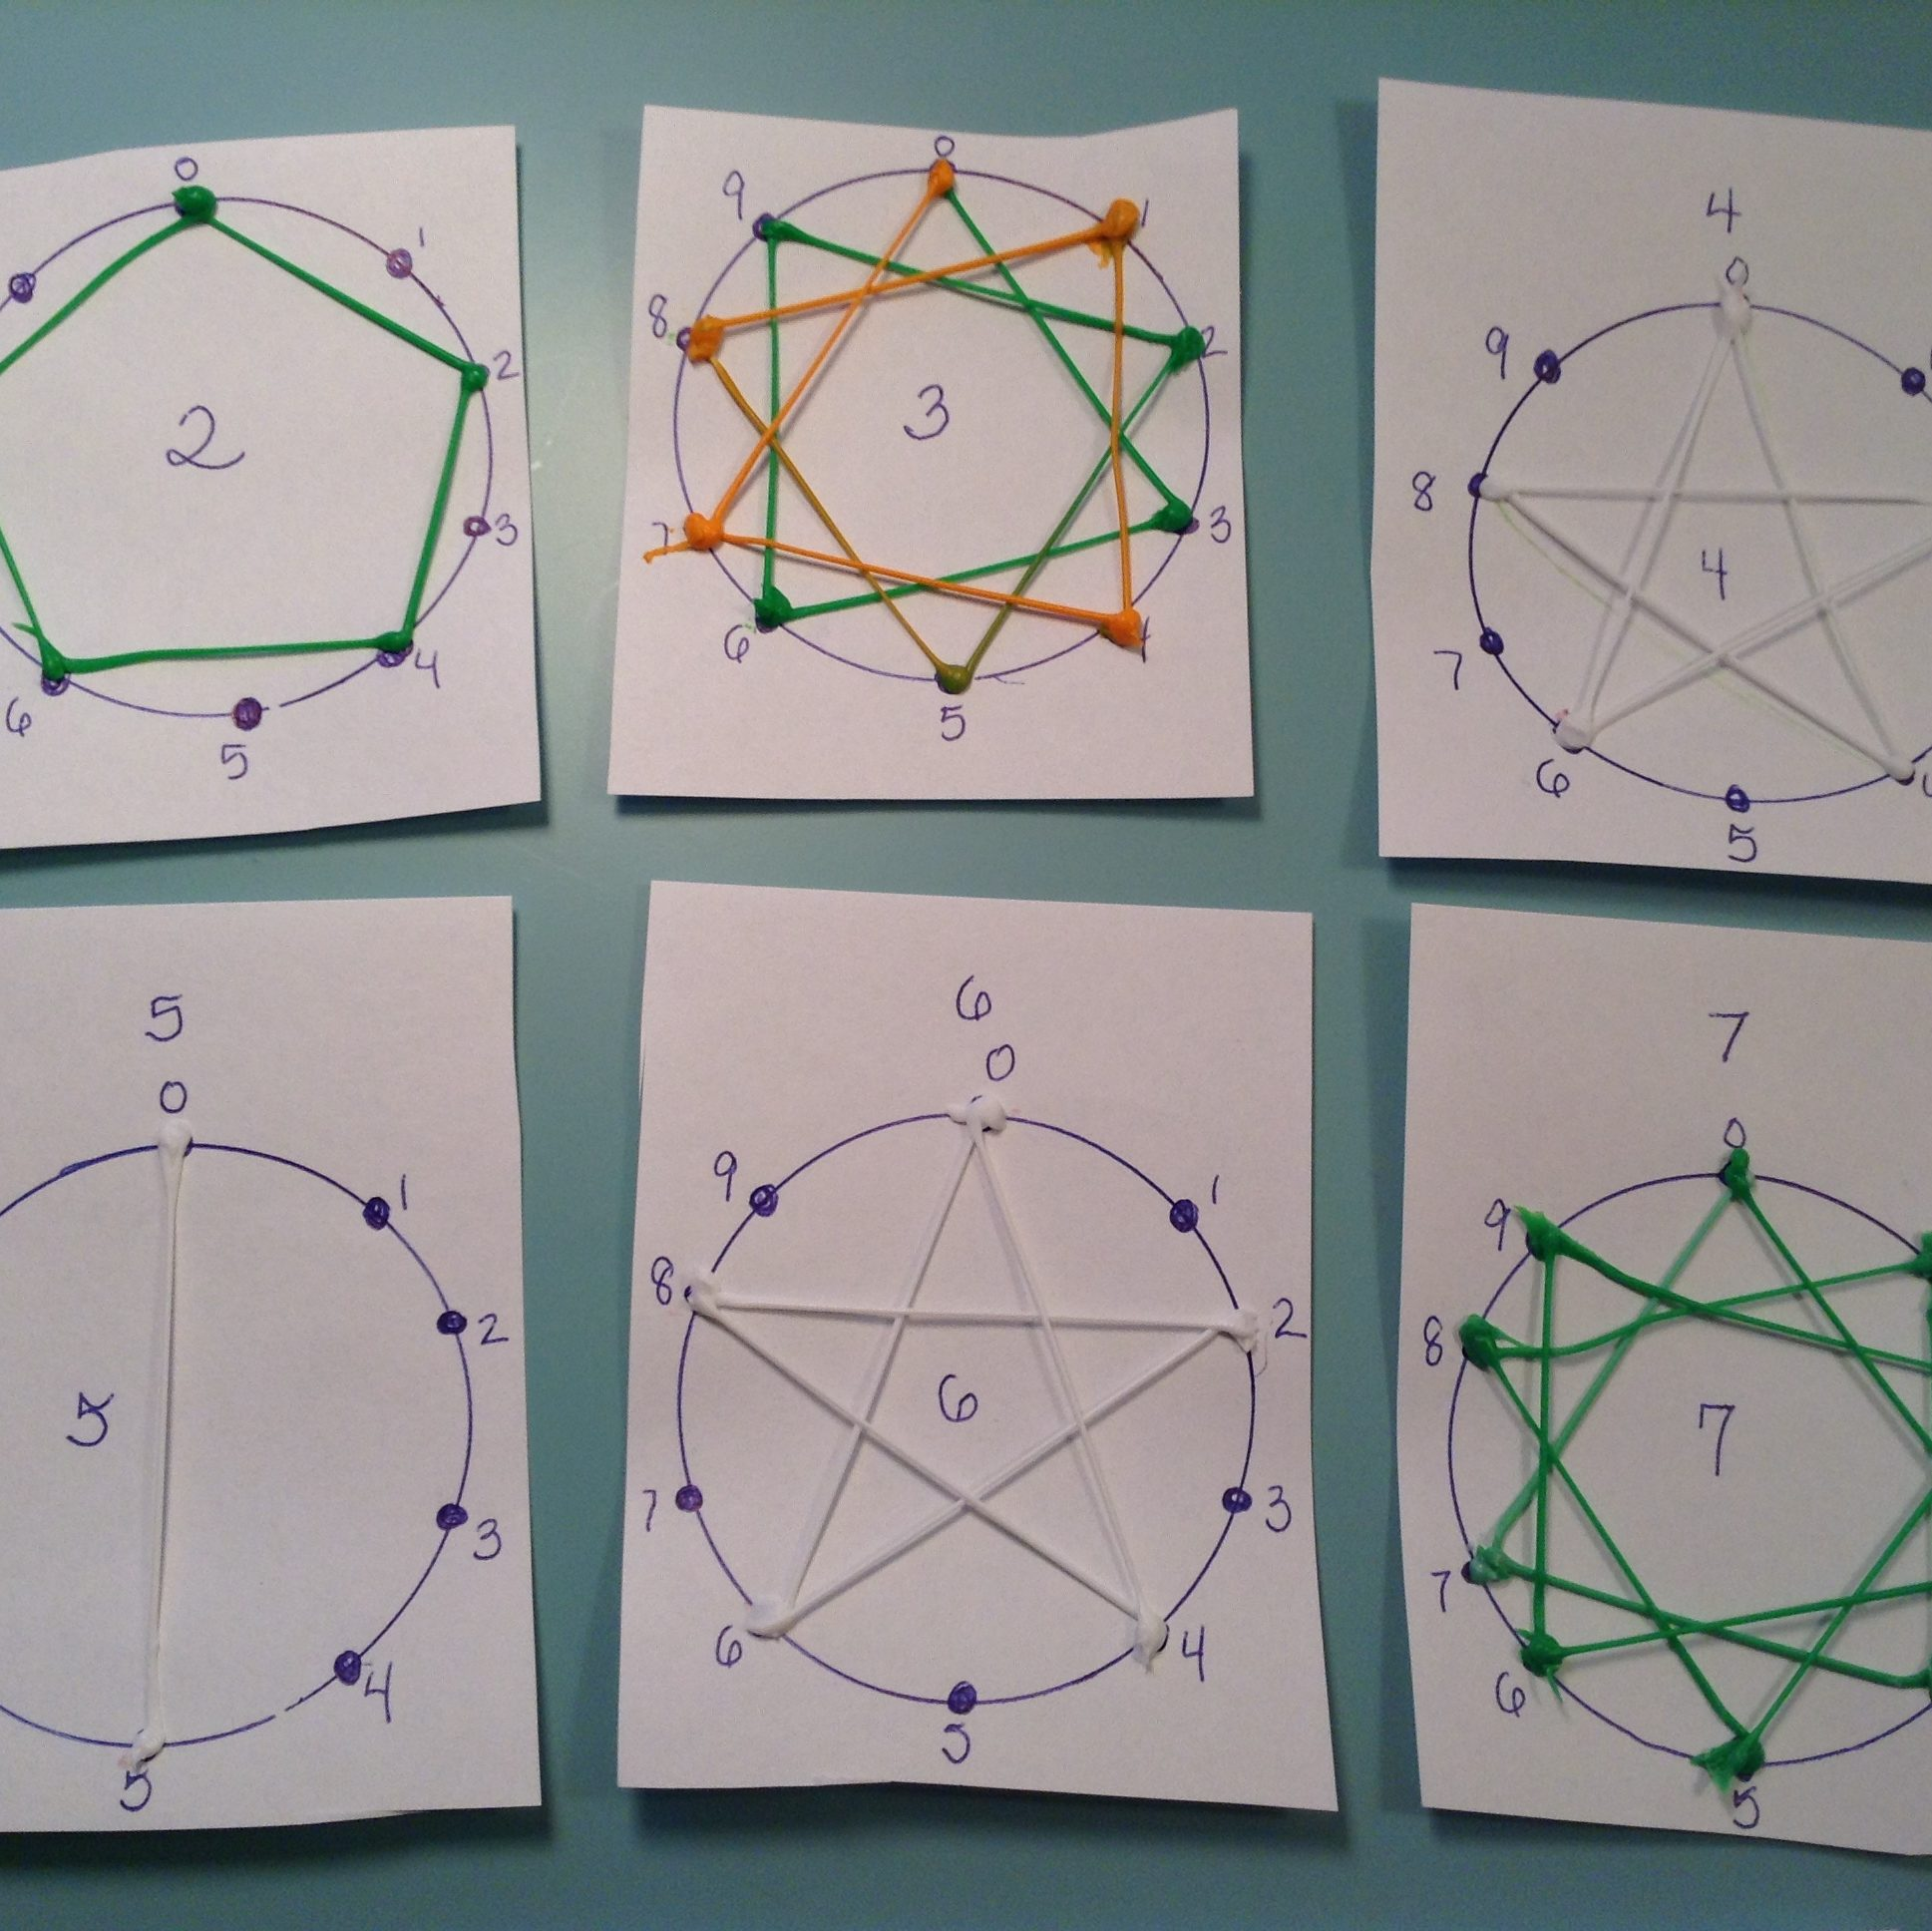 hight resolution of Doodle-the-Dots (Multiplication Patterns) - 3Doodler